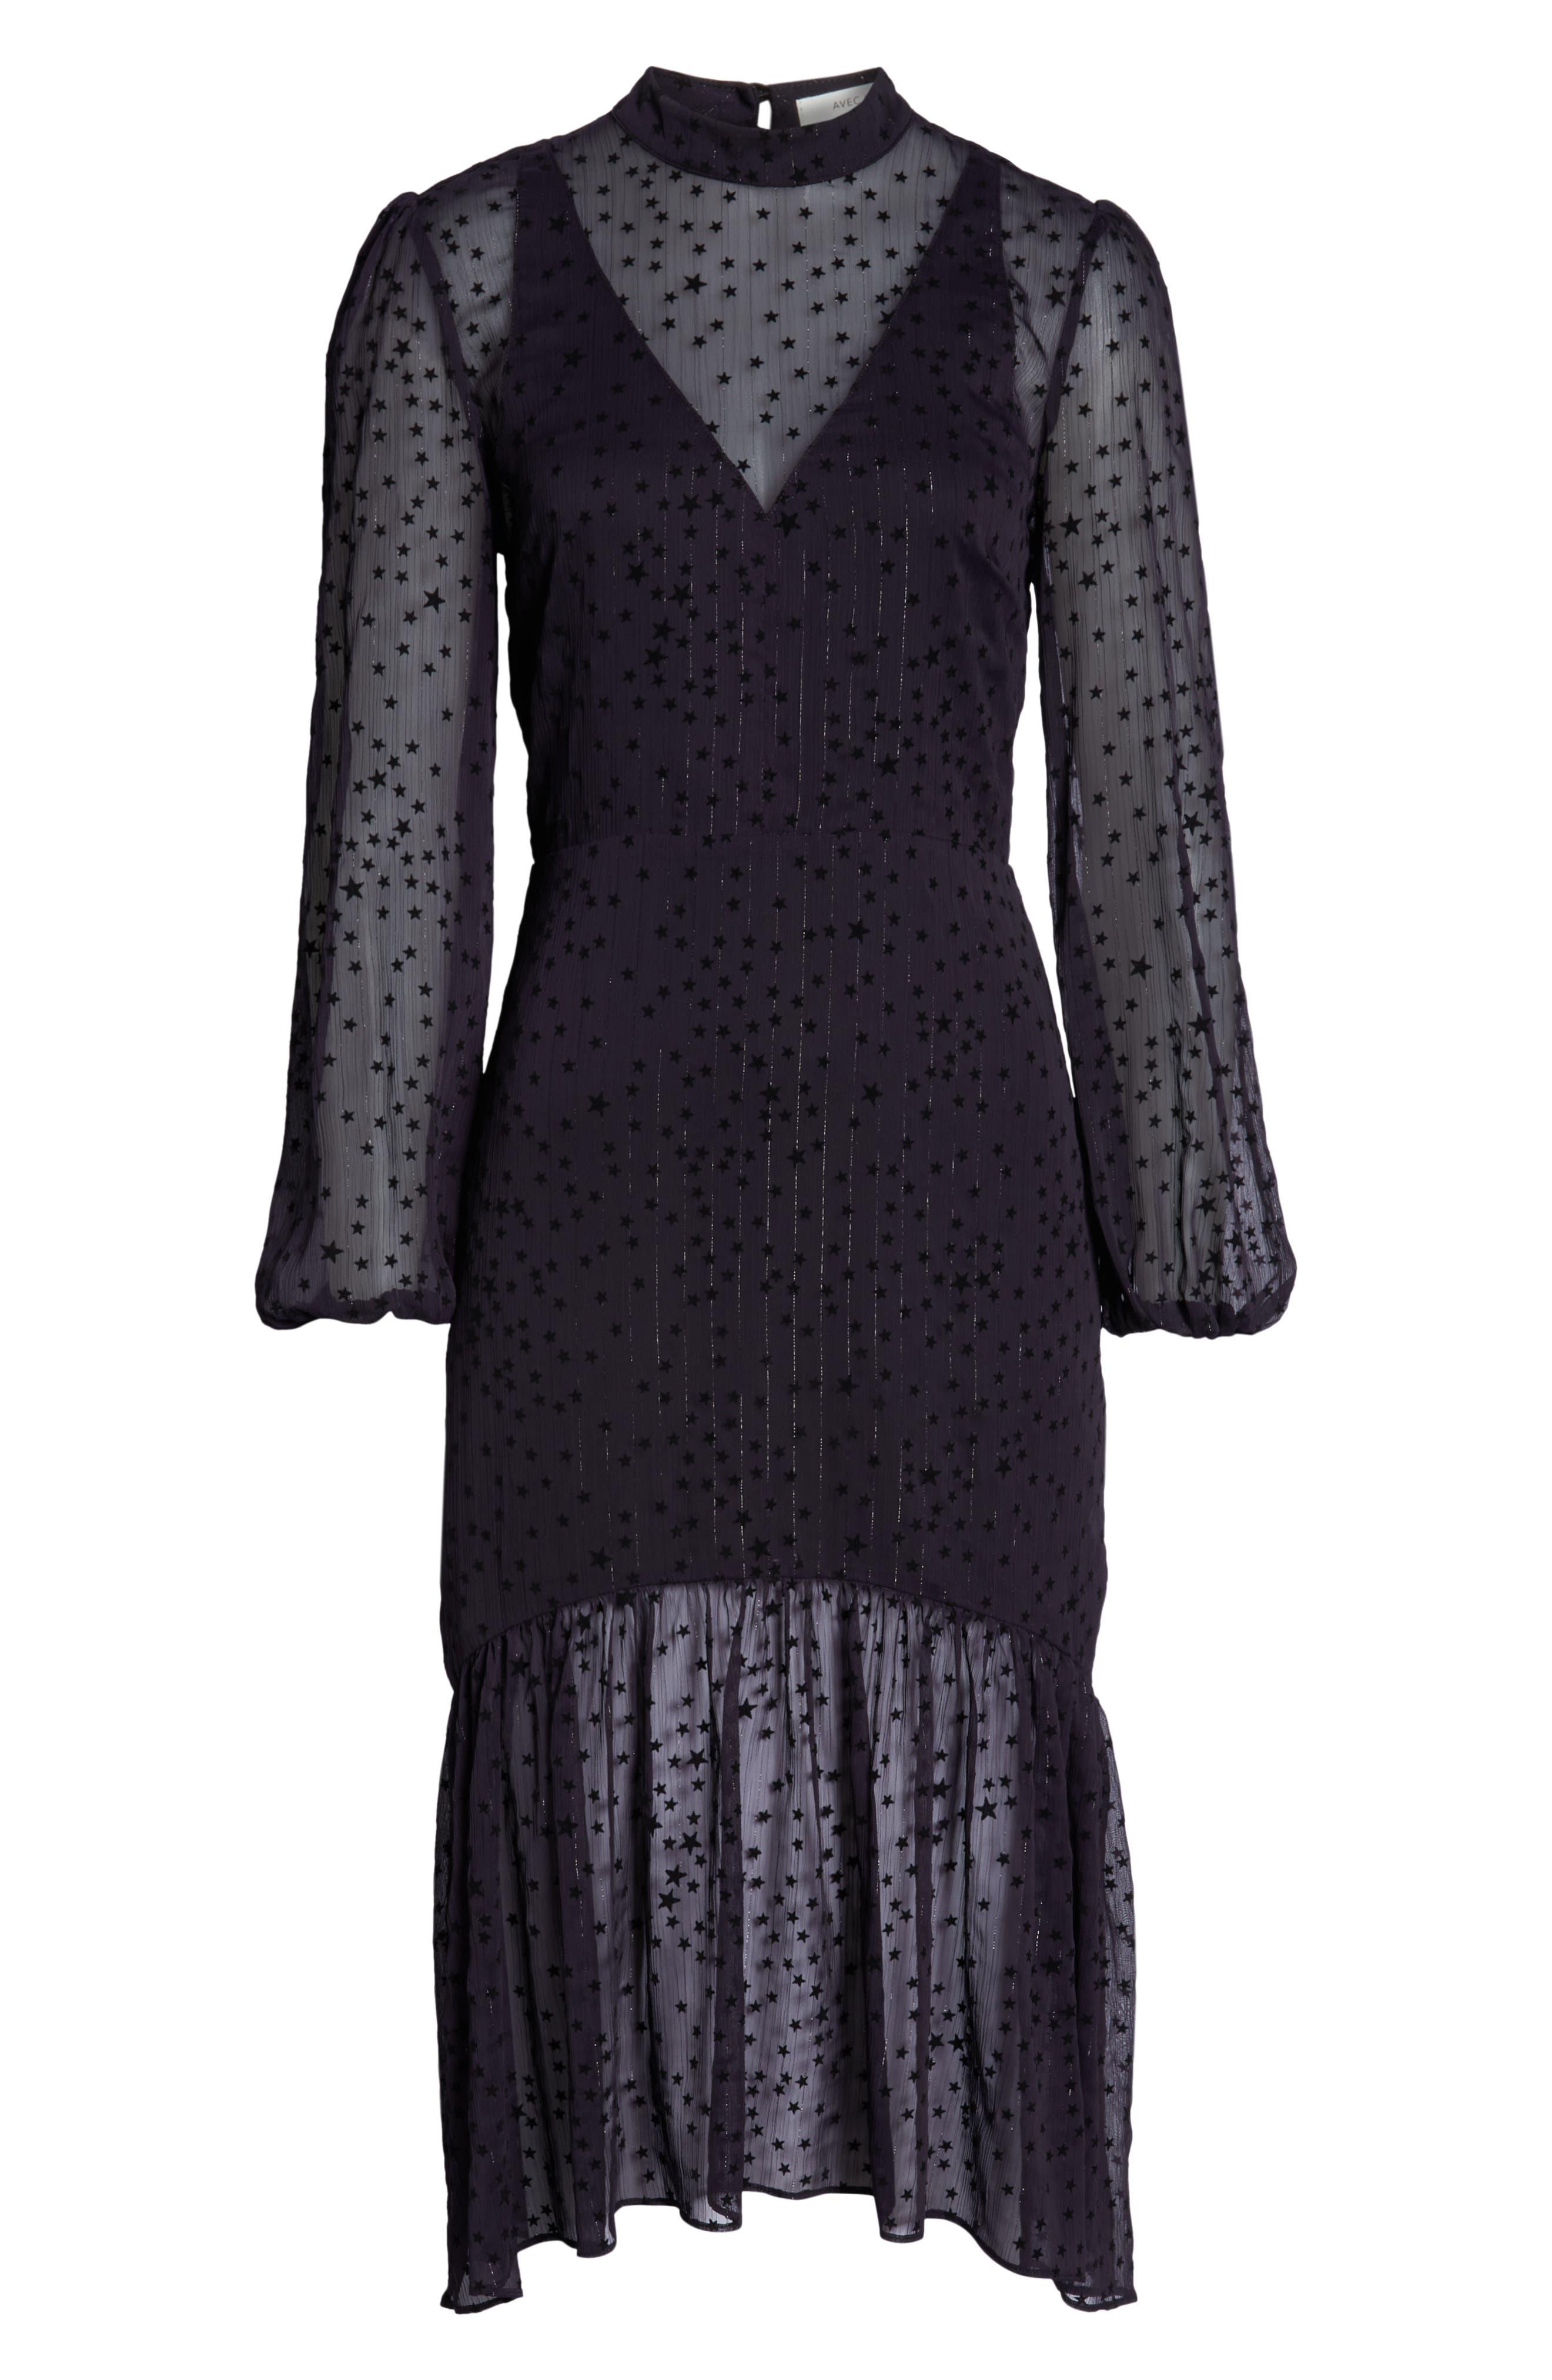 AVEC LES FILLES,                             Flocked Star Ruffle Dress,                             Alternate thumbnail 7, color,                             NAVY/ BLACK